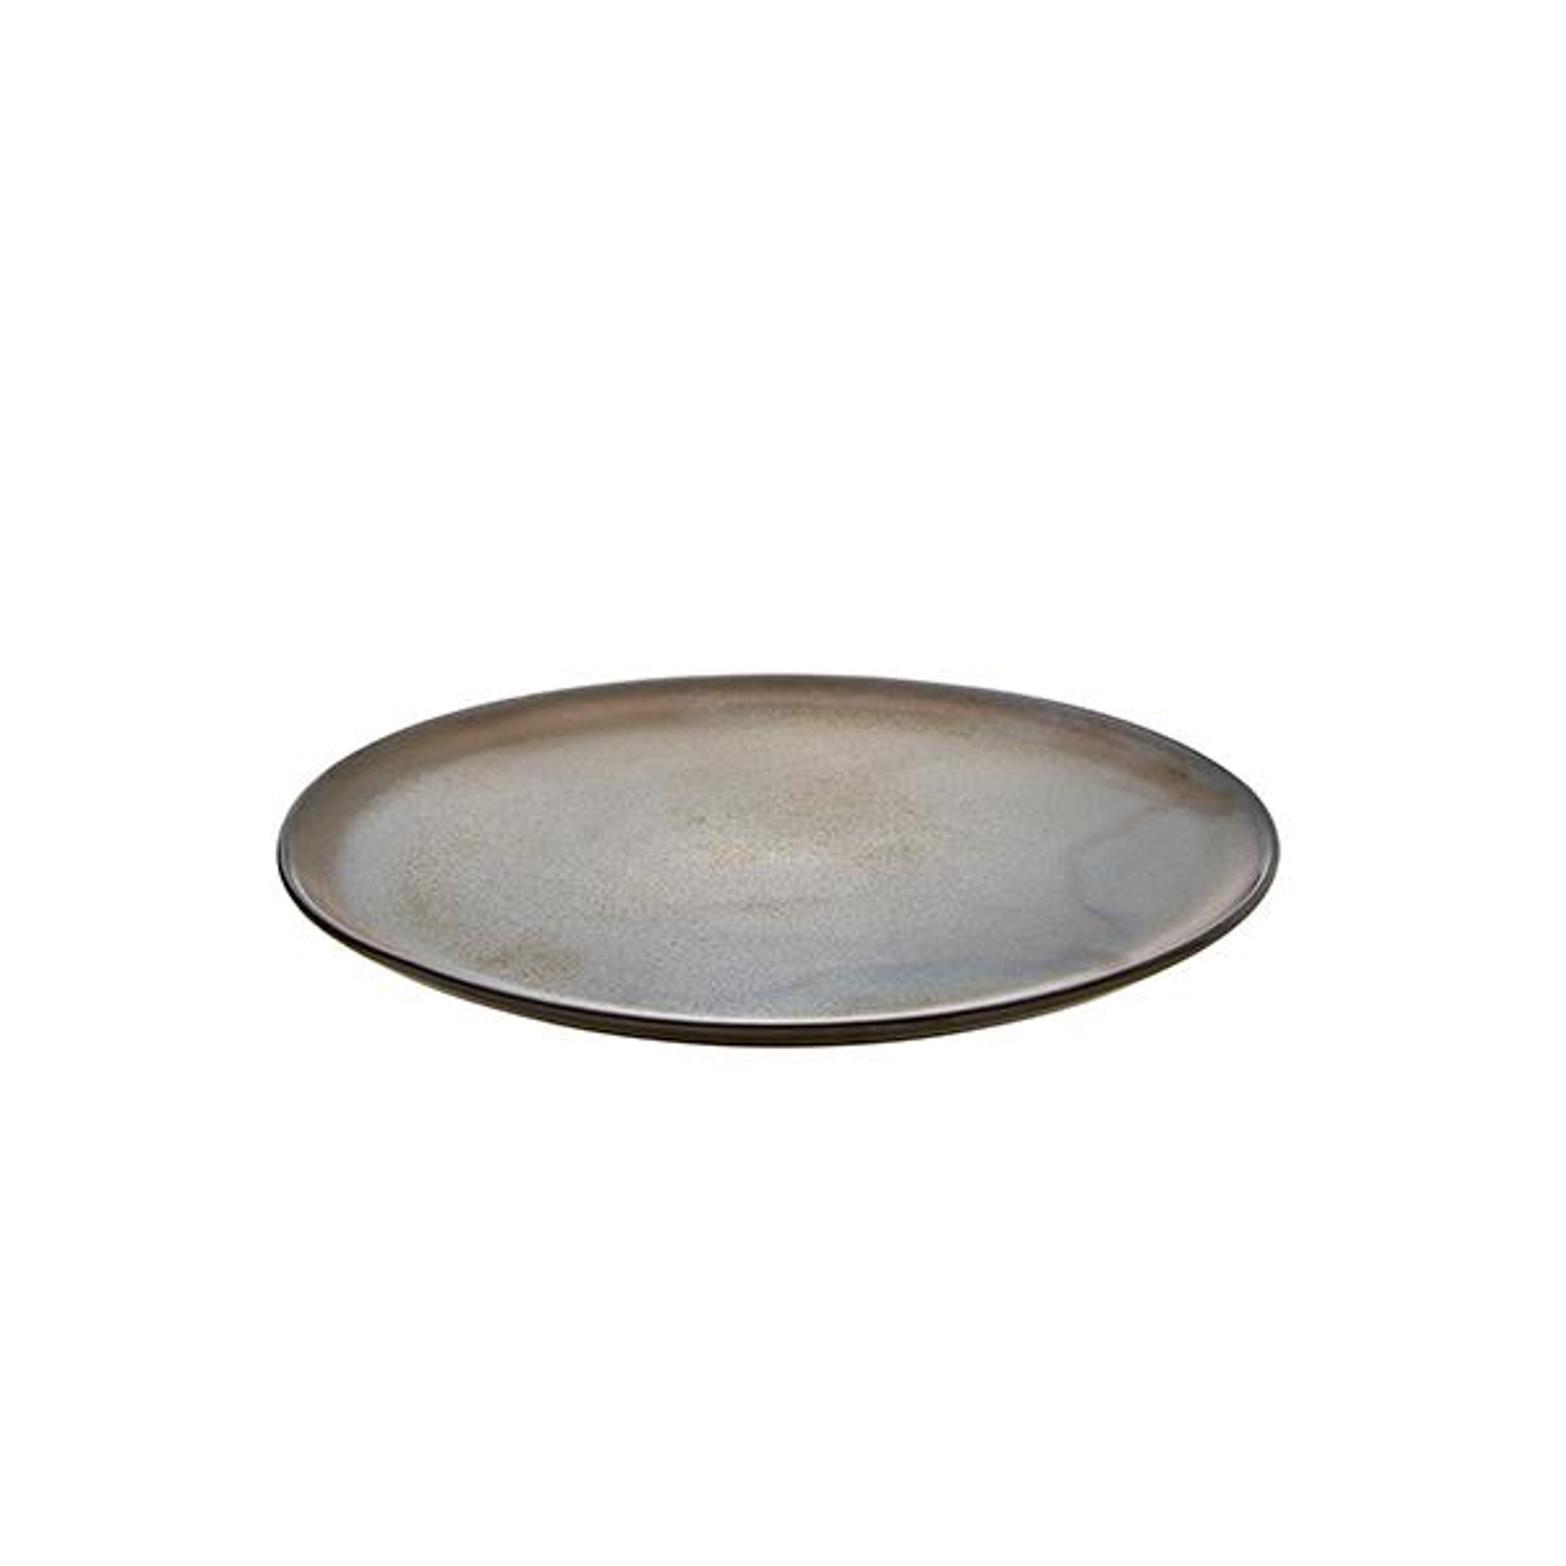 Онлайн каталог PROMENU: Тарелка Aida RAW METALLIC BROWN, диаметр 28 см, коричневый                               15562